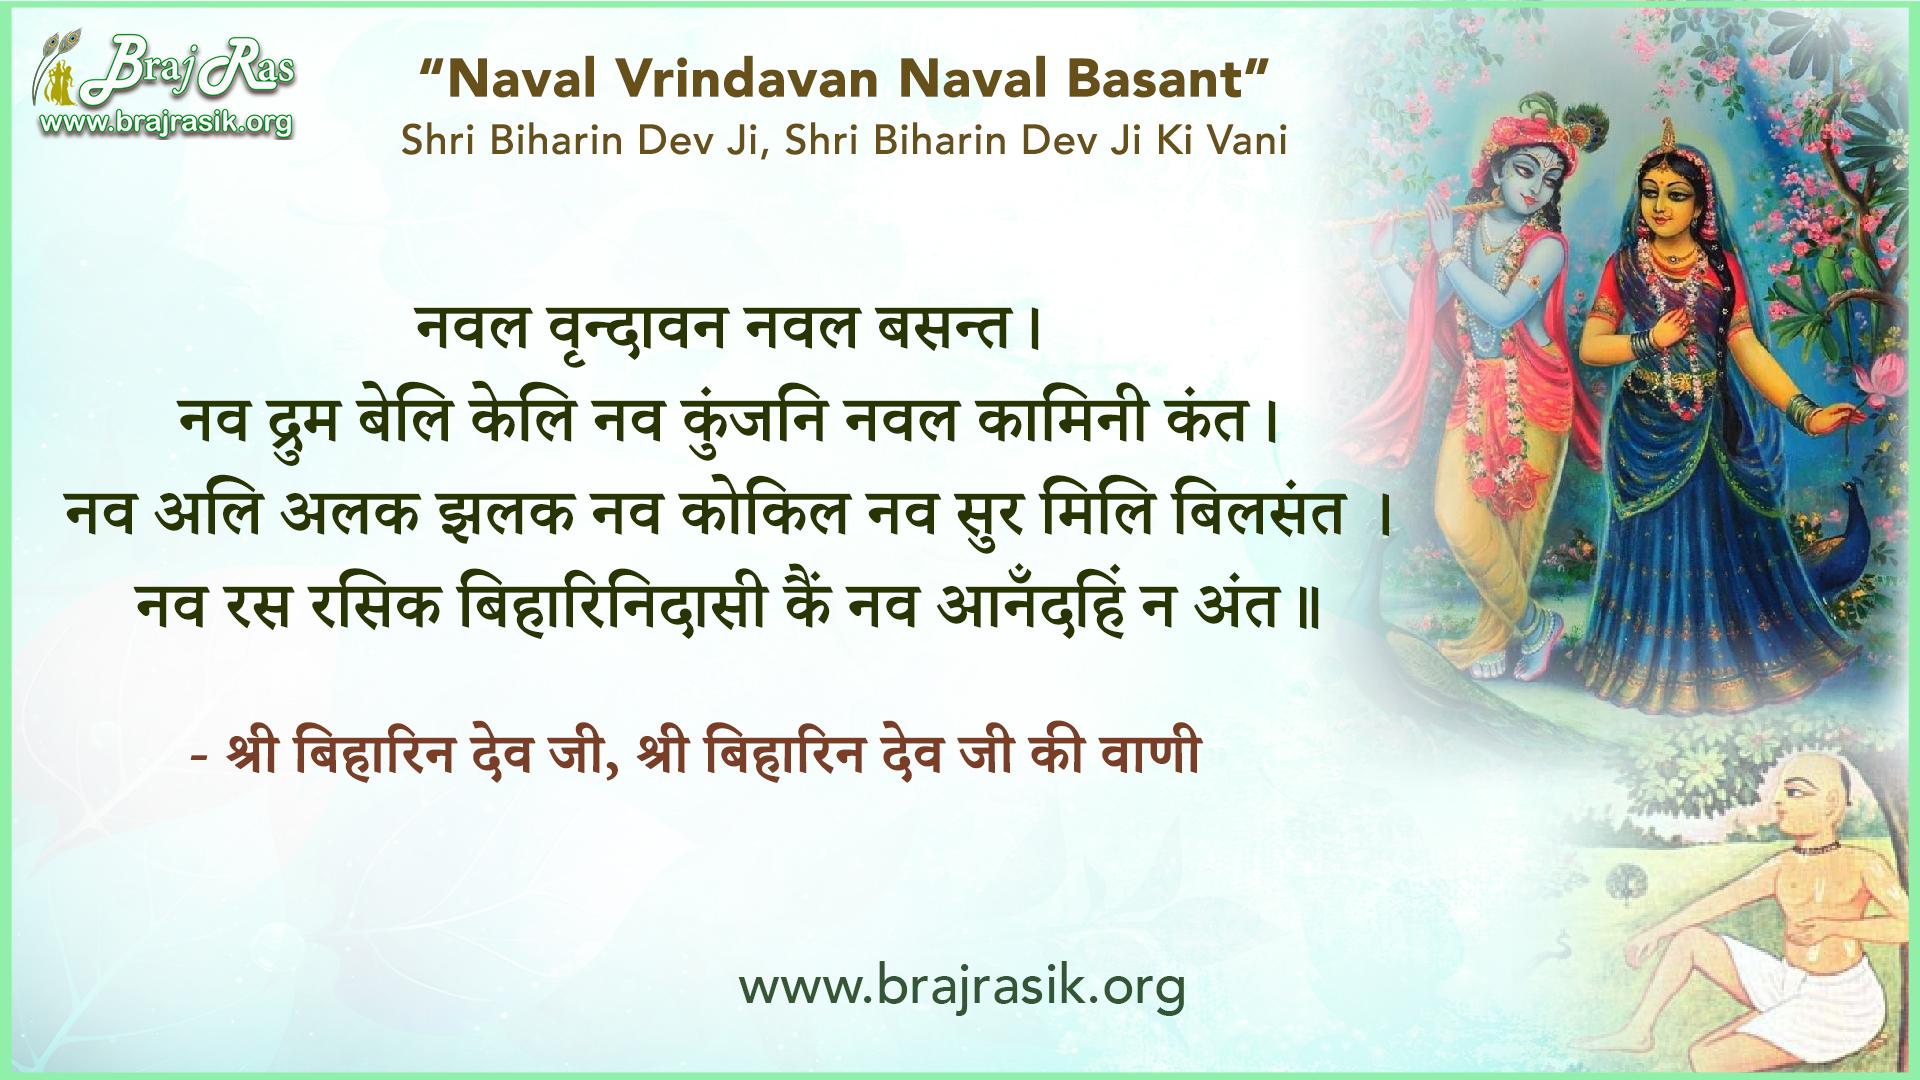 Naval Vrindavan Naval Basant - Shri Biharin Dev Ji, Shri Biharin Dev Ji Ki Vani